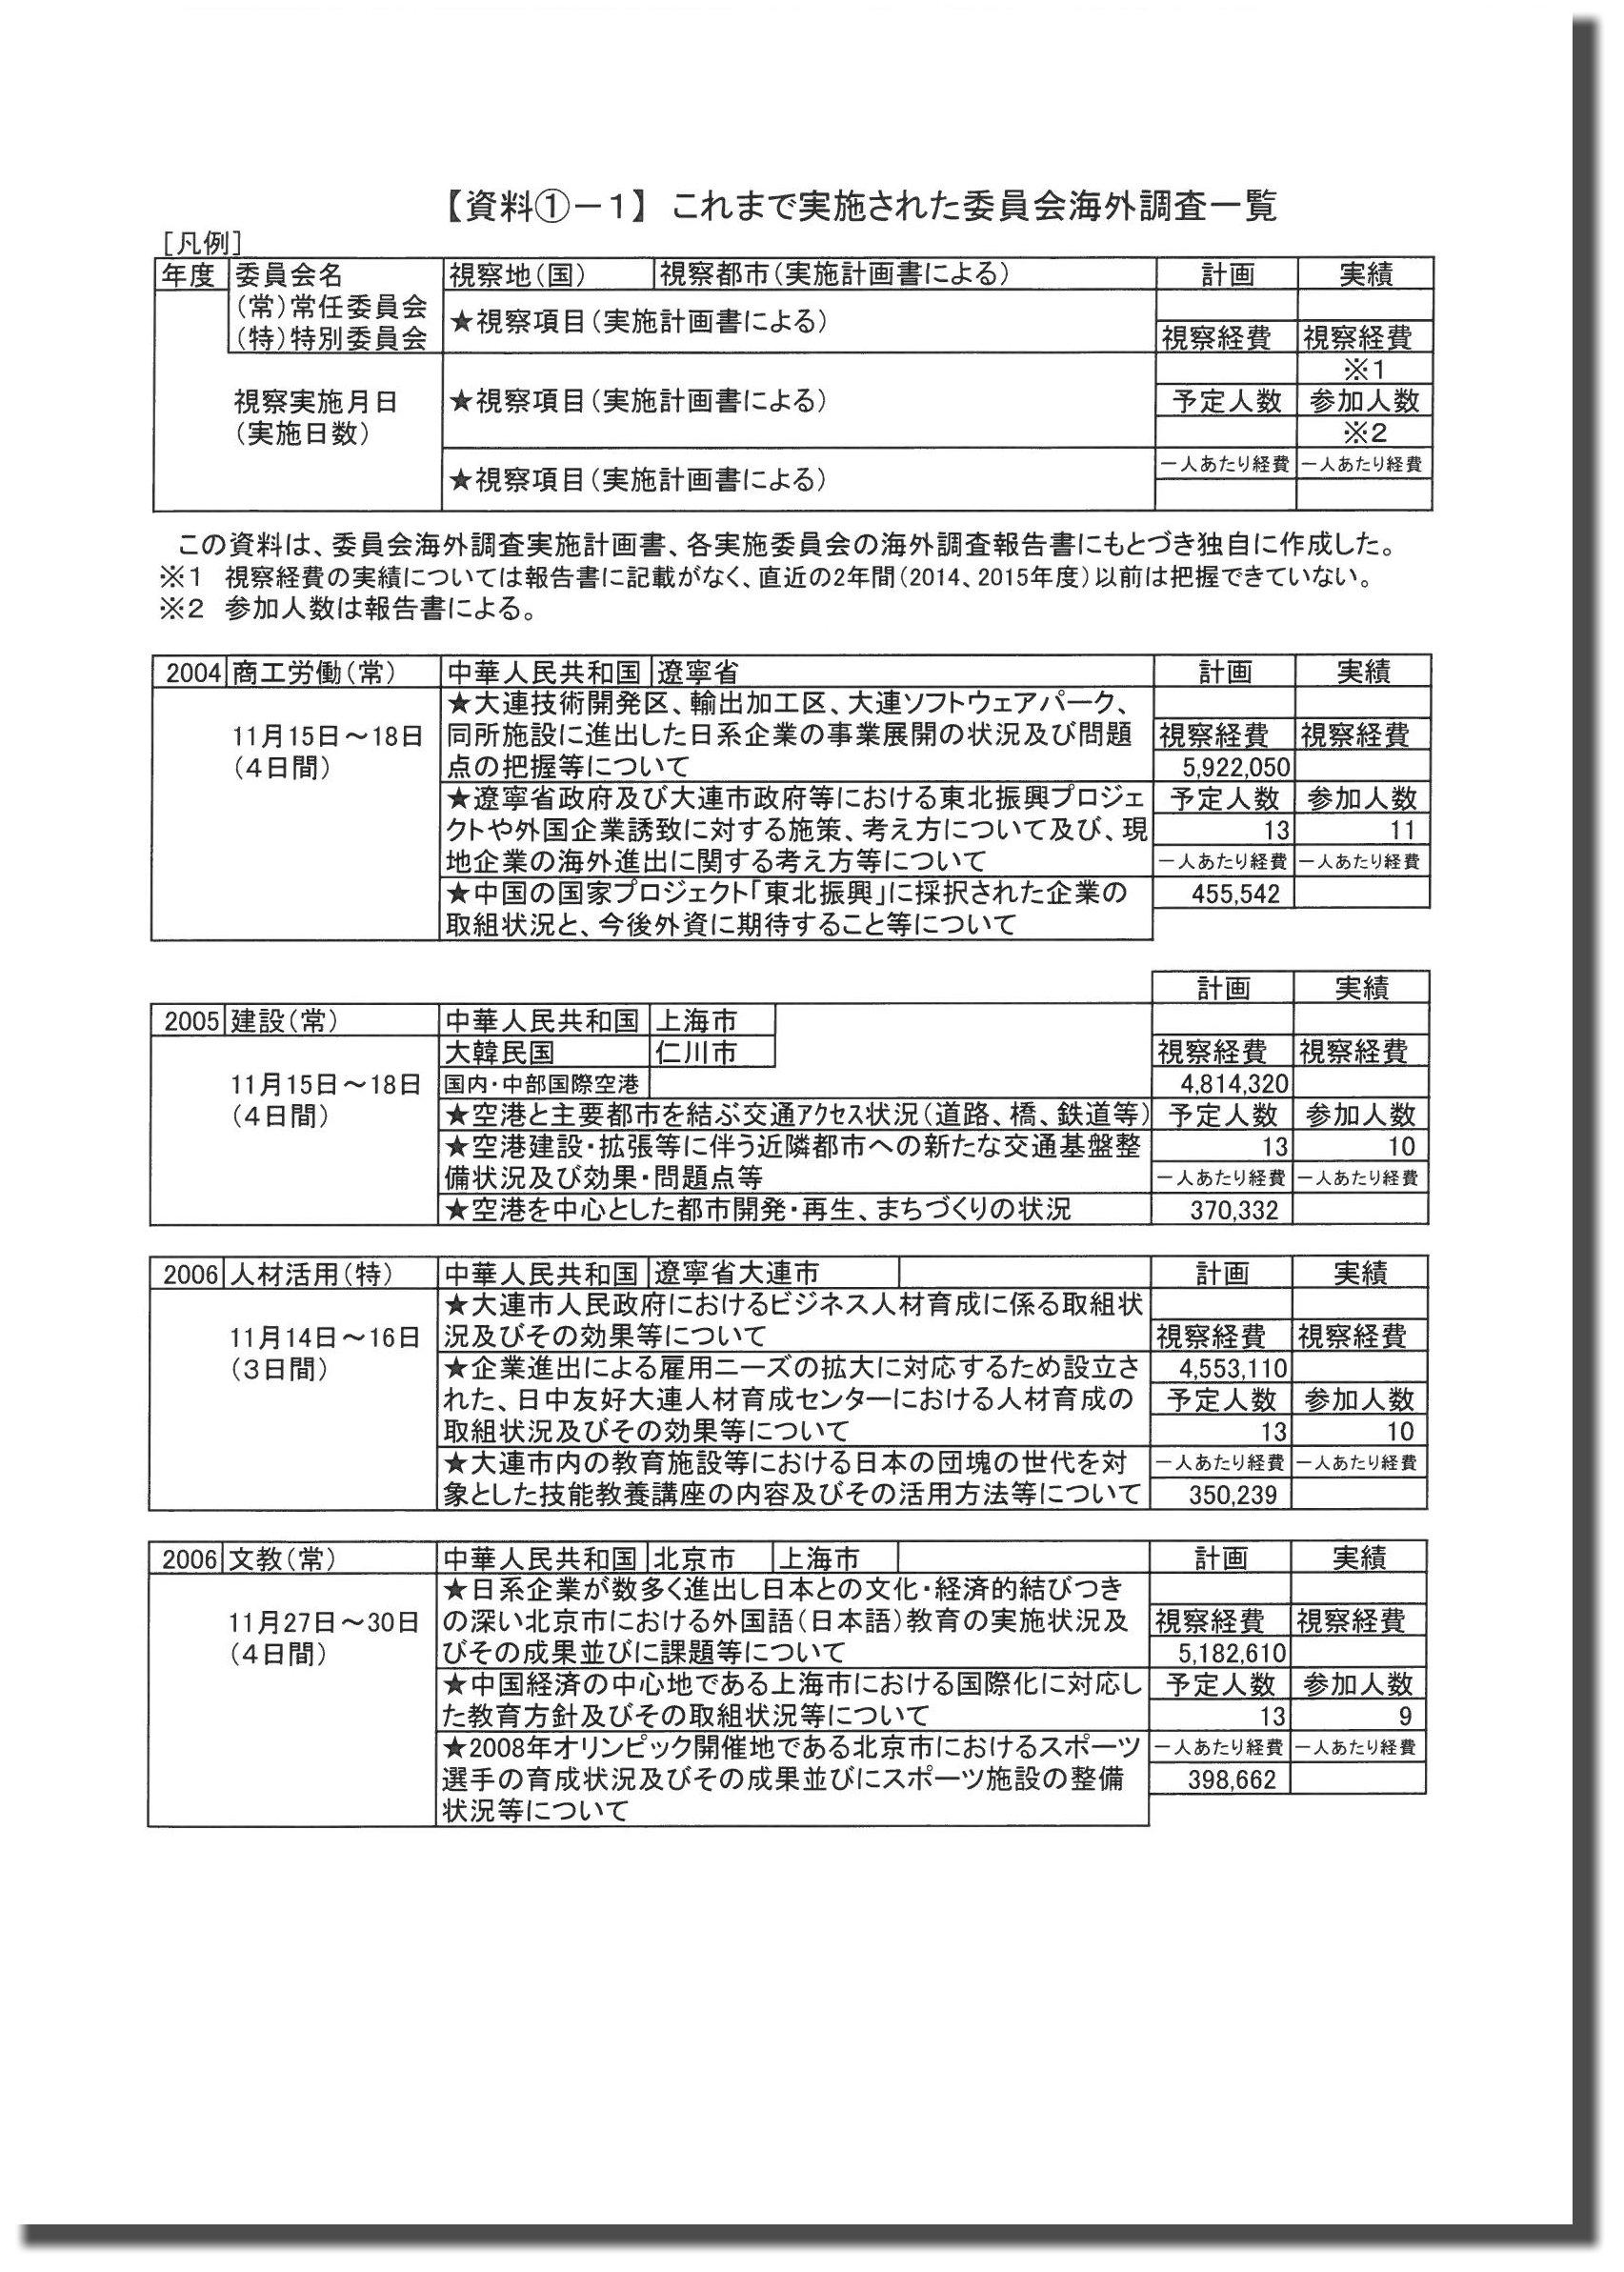 kenkai-shiryo-1-kage